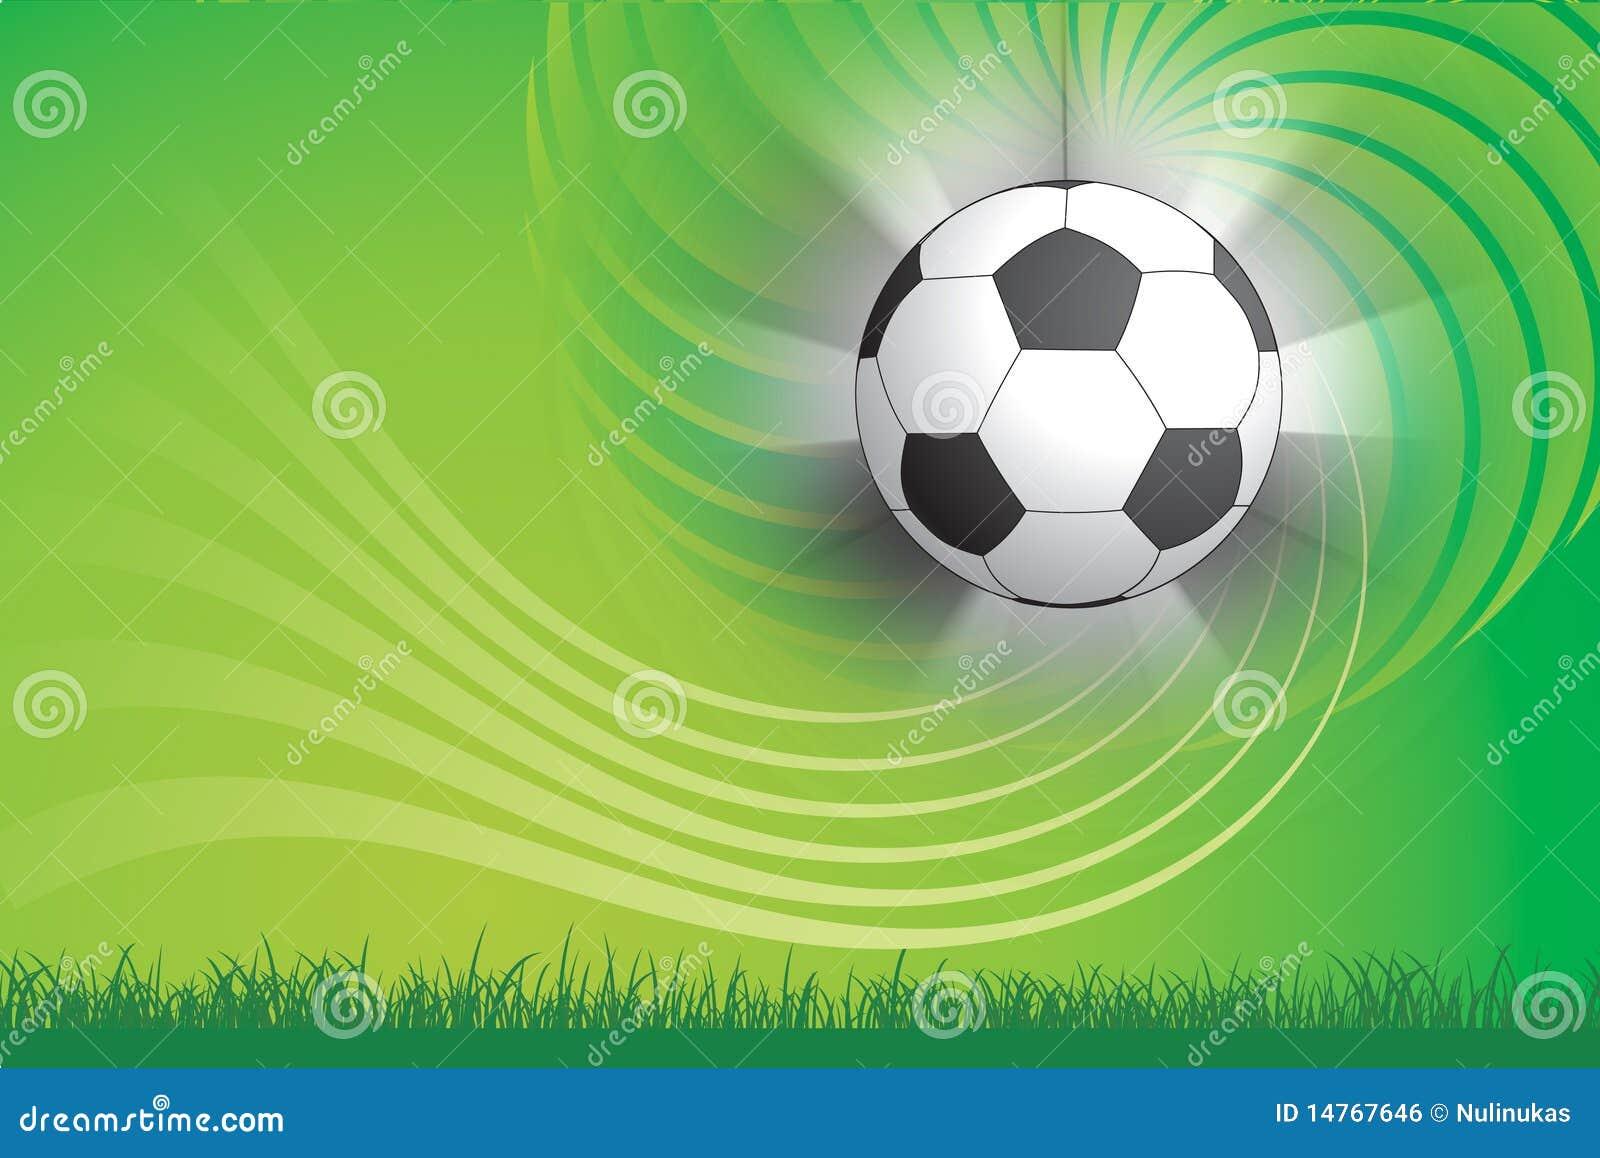 Fondos De Pantalla Fútbol Pelota Silueta Deporte: Balón De Fútbol Y Fondo Verde Imagen De Archivo Libre De